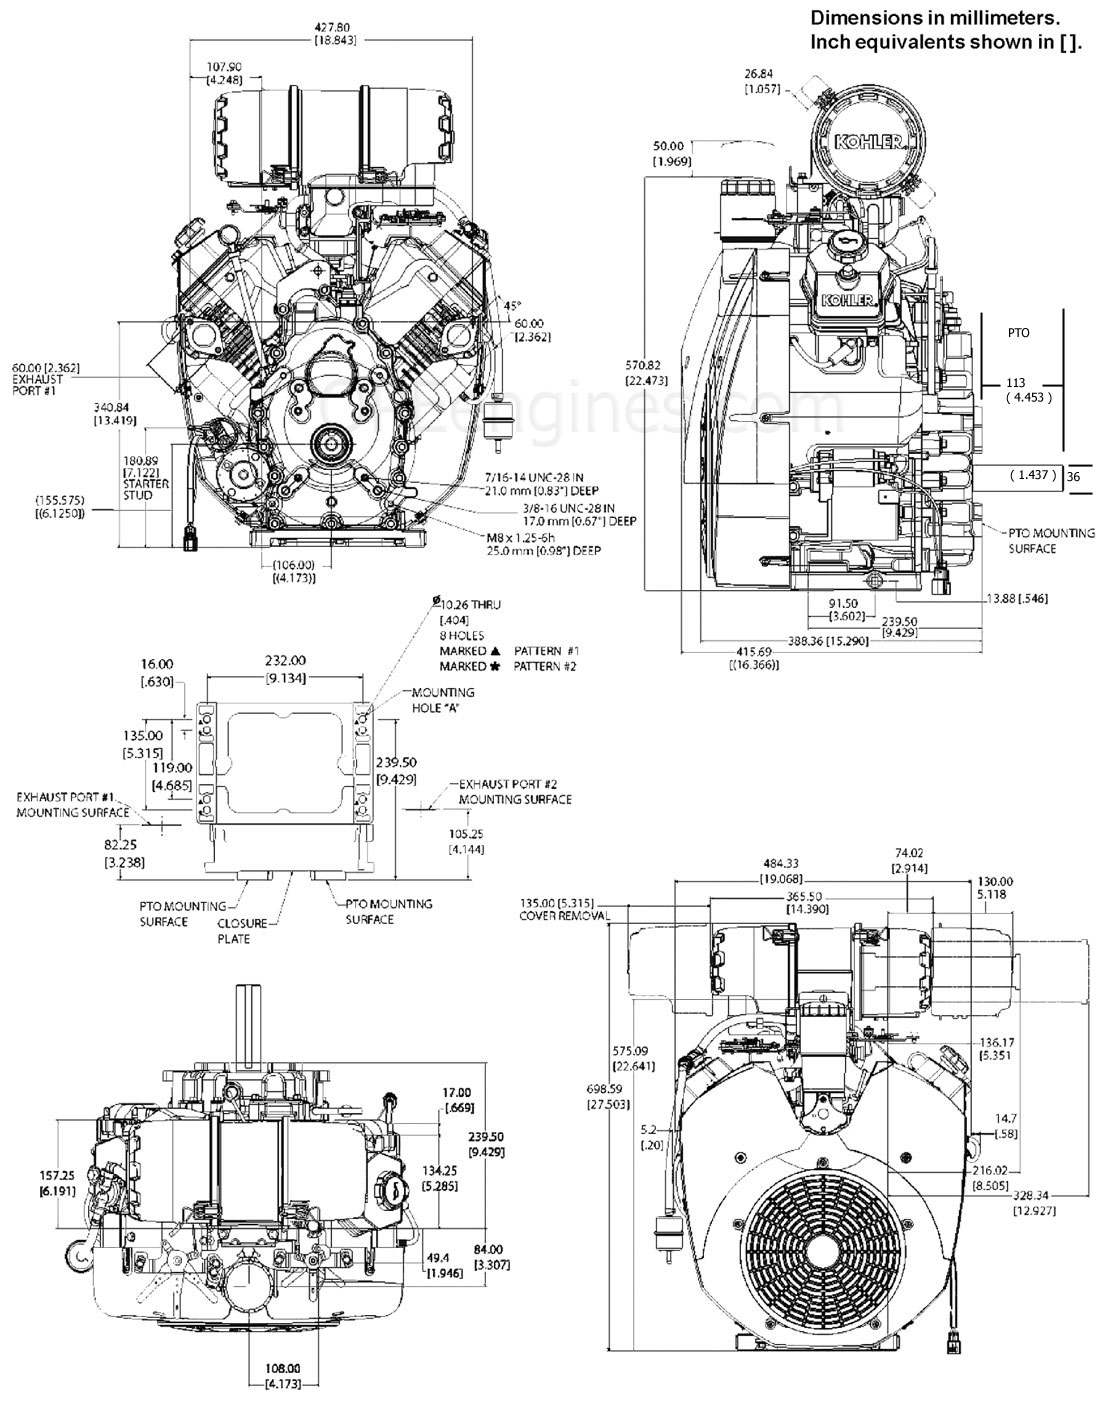 CH980_drawings?resize=680%2C878&ssl=1 25 hp kohler wiring diagram kohler command 25 hp diagram, kohler kohler motor wiring diagram at creativeand.co